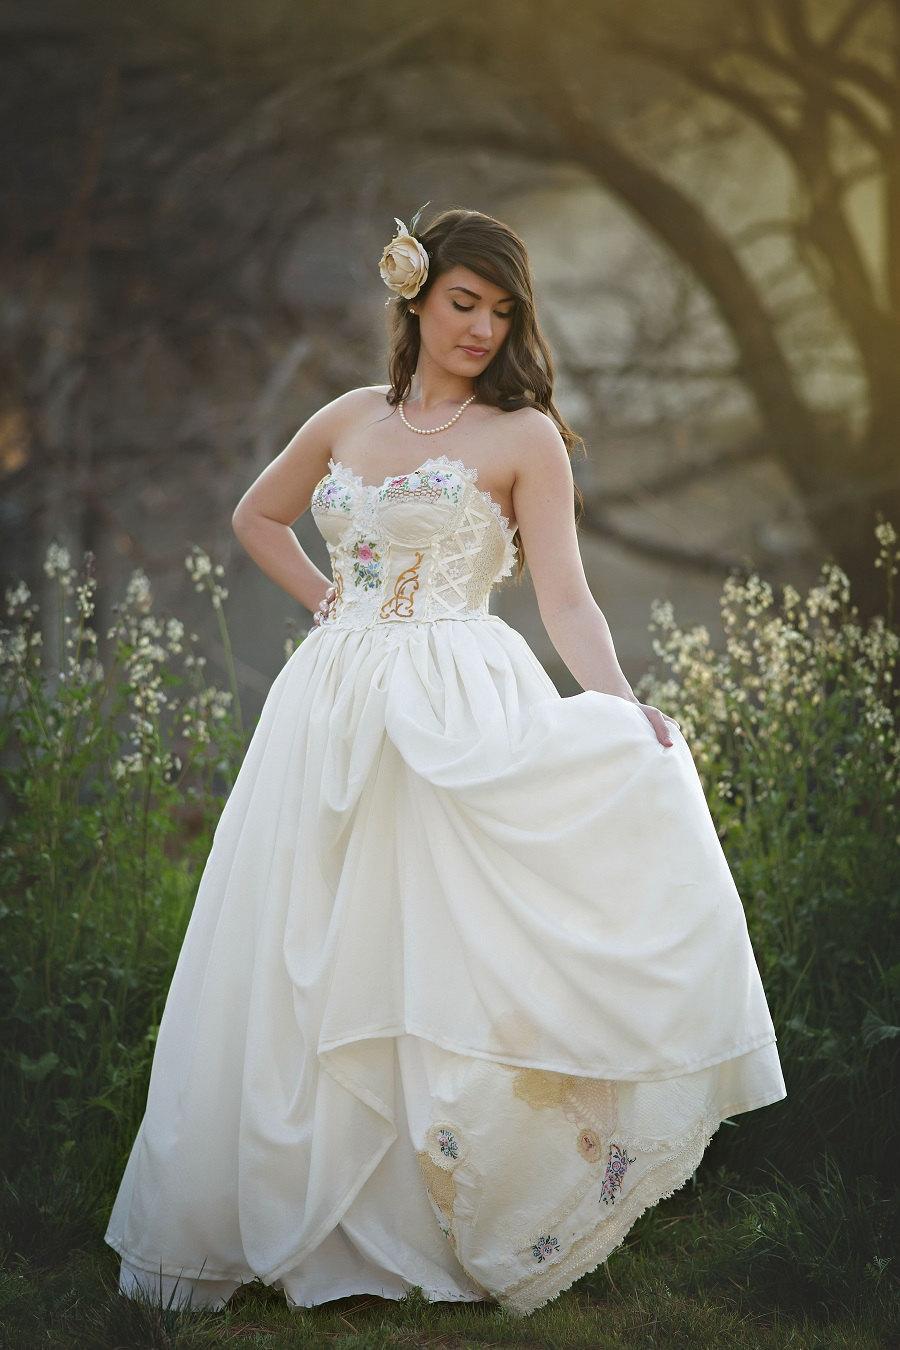 Wedding - Storybook Romance Wedding Dress, Unique Upcycled Vintage Wedding Dress, Garden Wedding Dress,Woodland Wedding Dress,Lace  Corset Dress